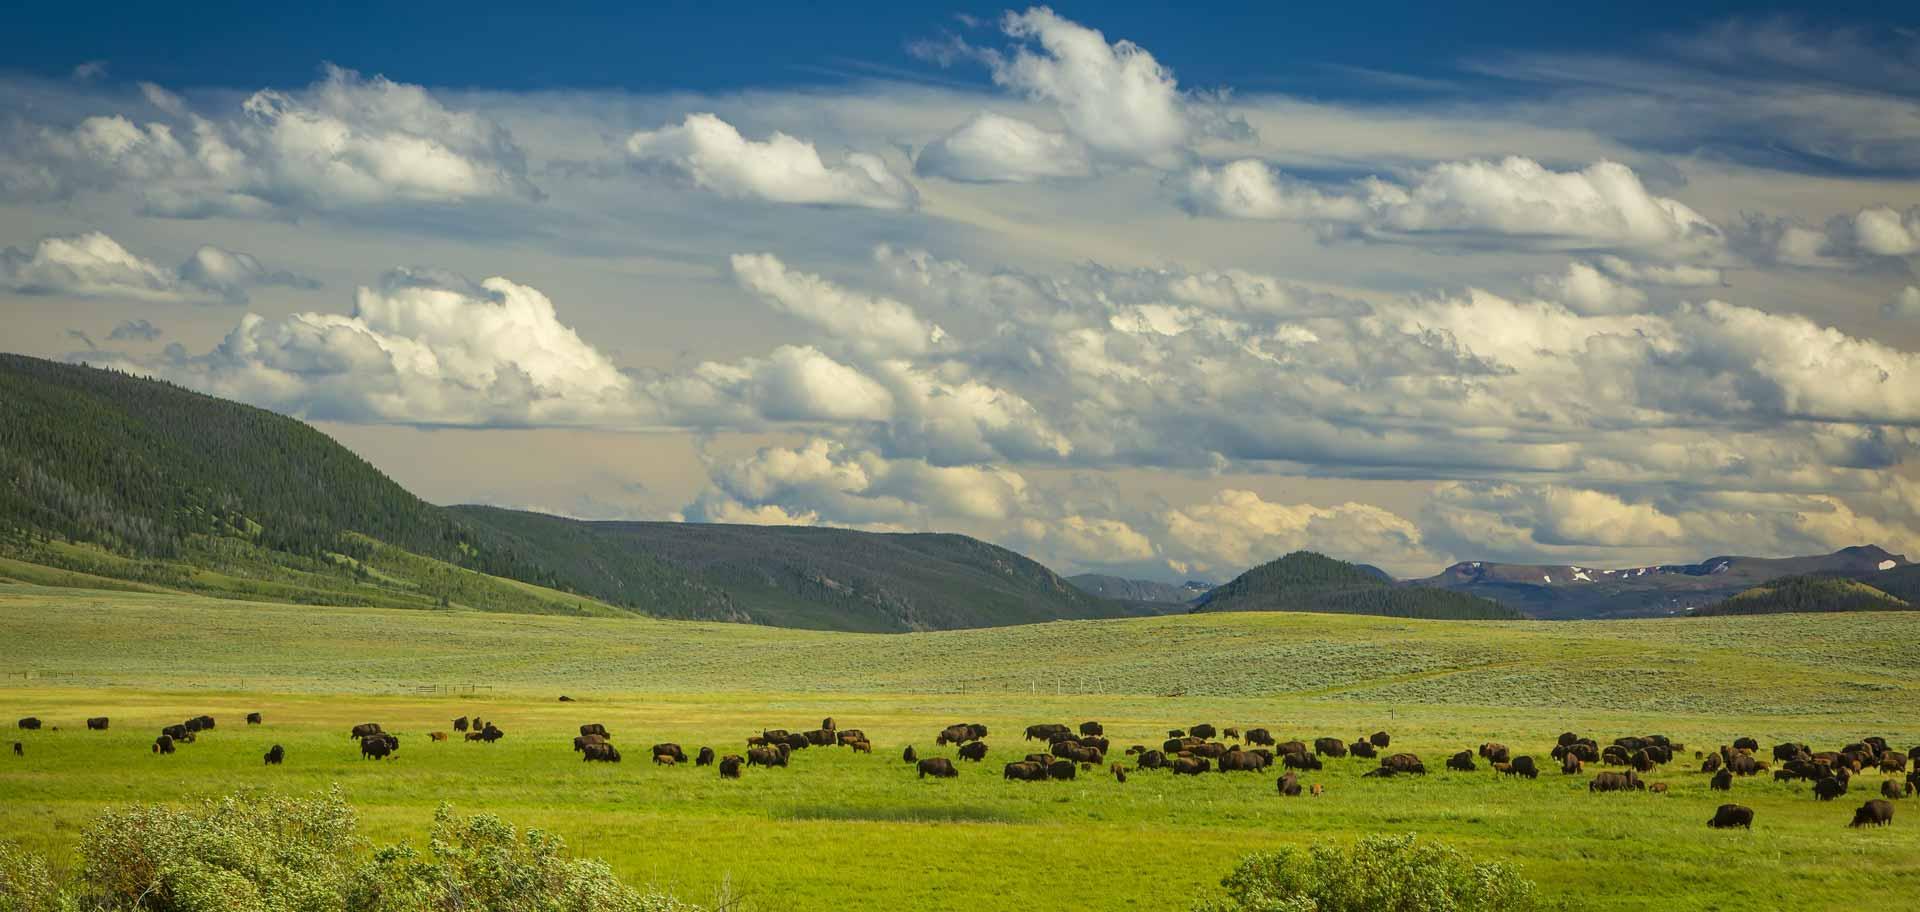 Bison Ranchers